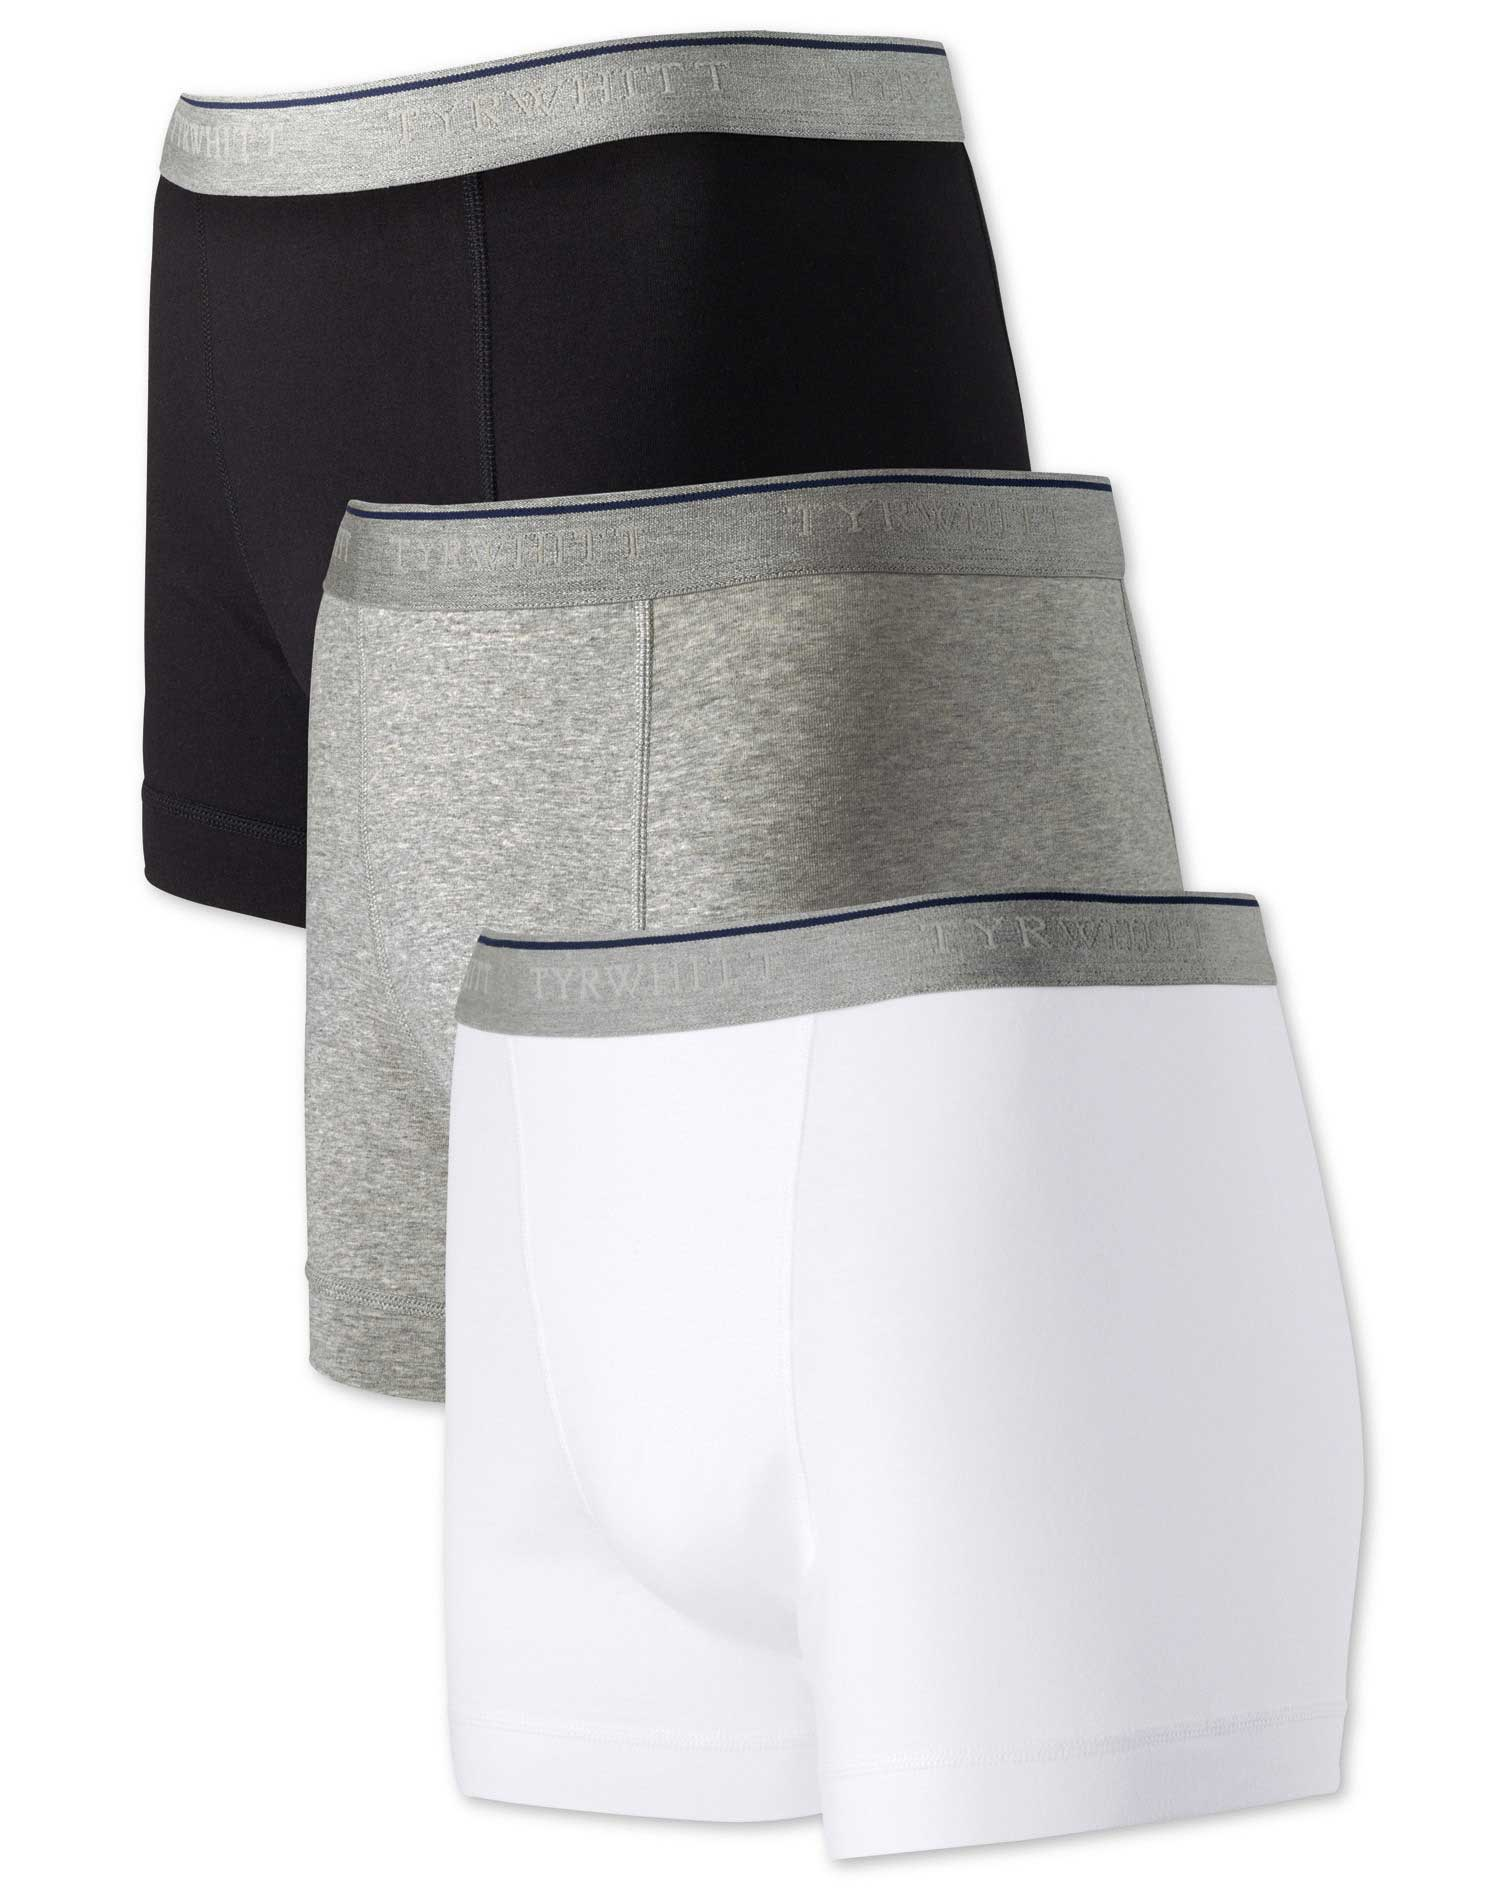 White Multi Jersey 3 Pack Trunks Size XL by Charles Tyrwhitt